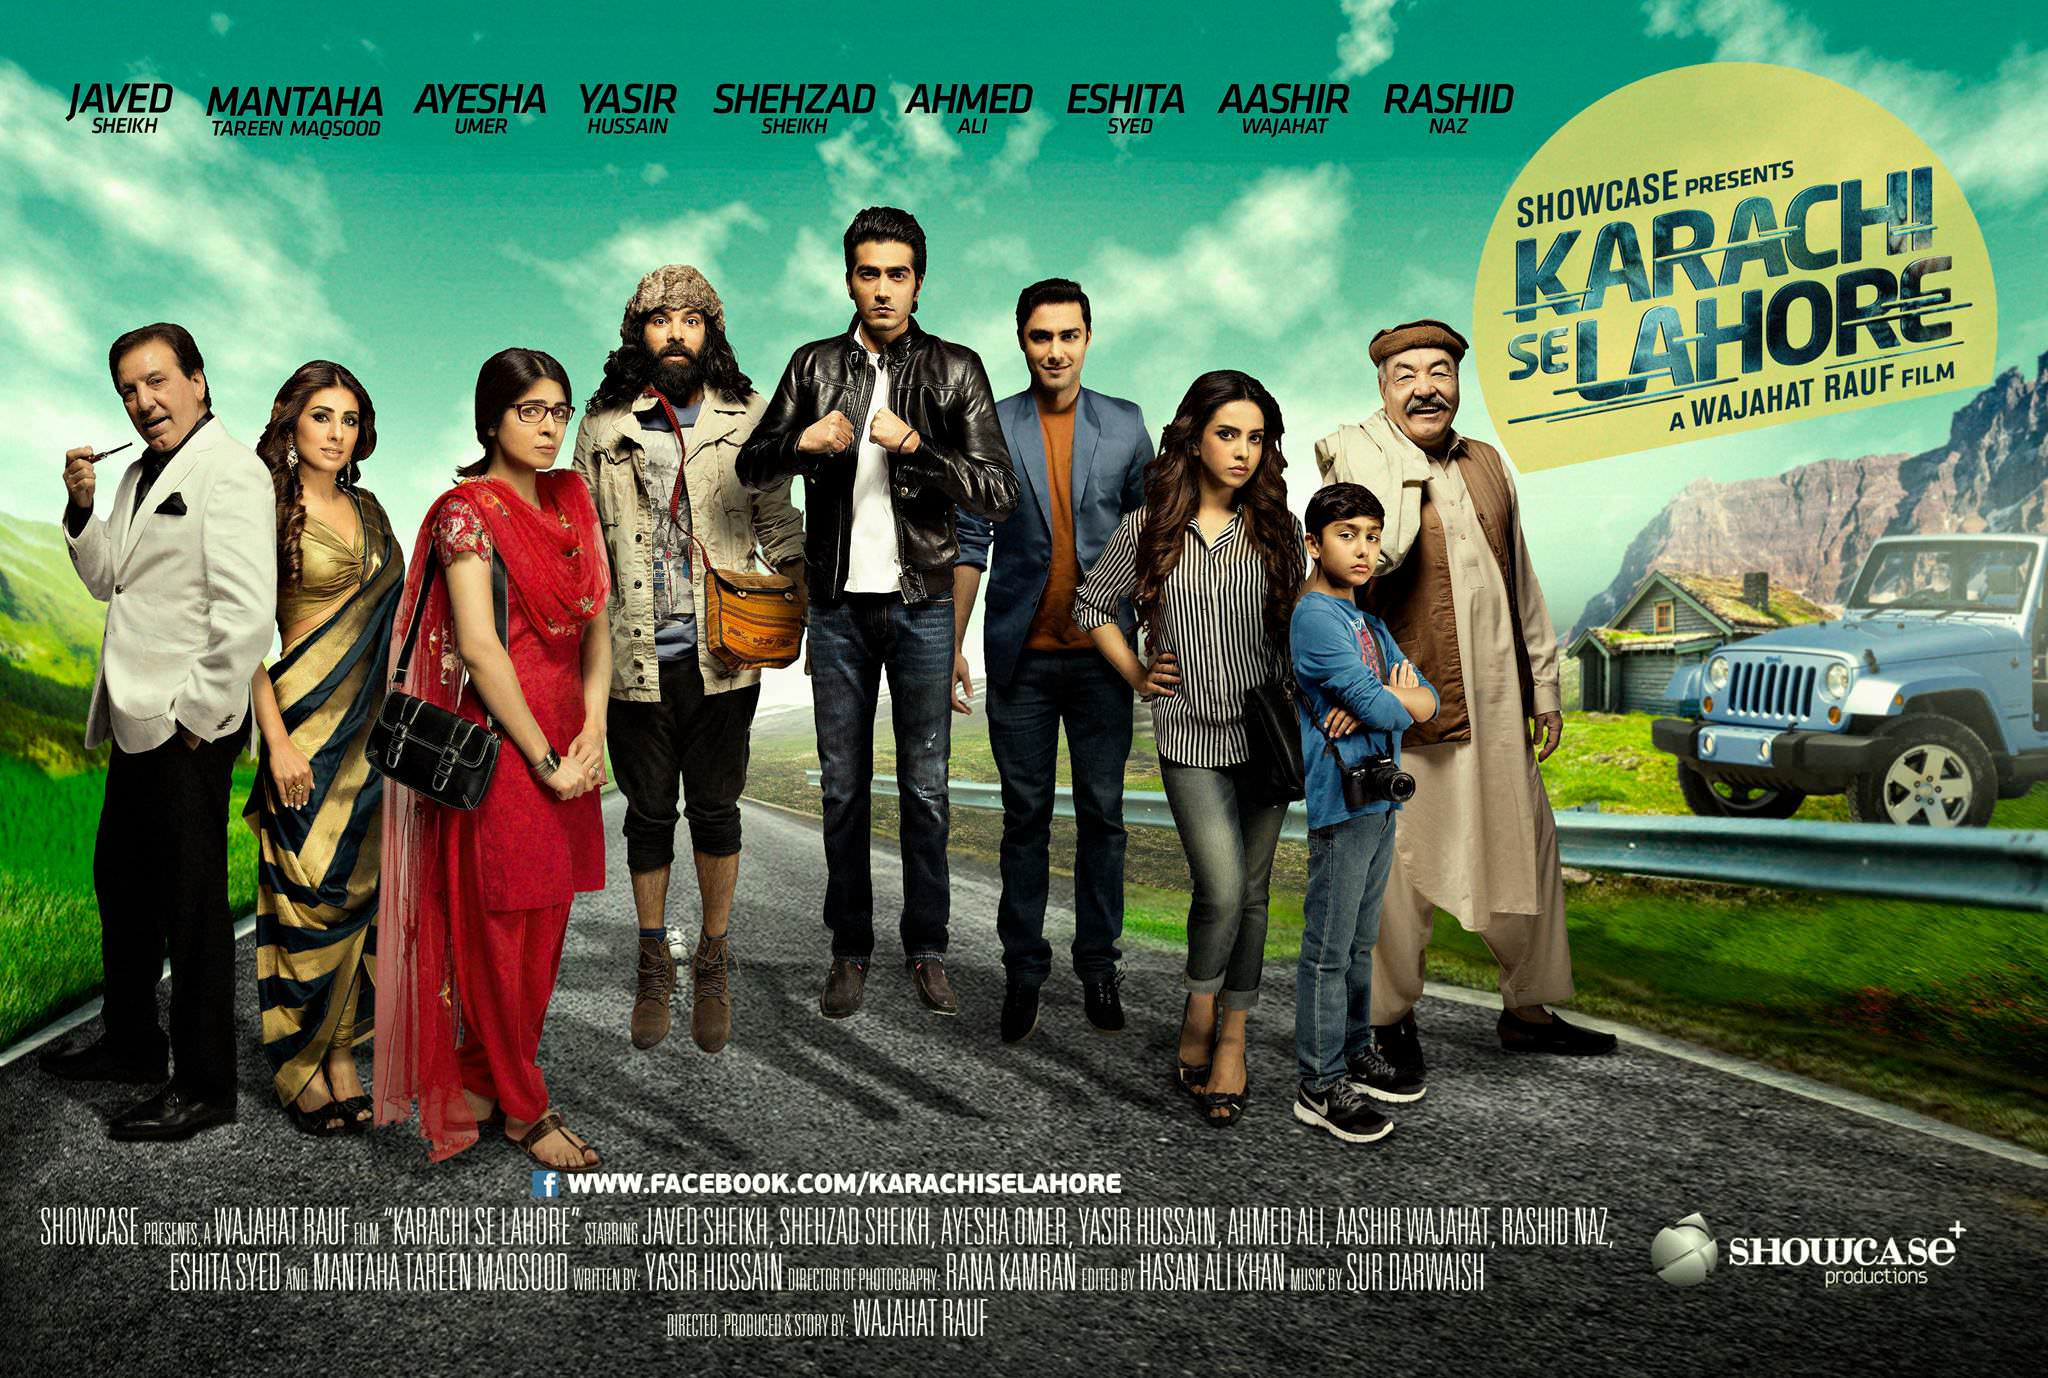 Karachi se Lahore (2015) - DVD PLANET STORE